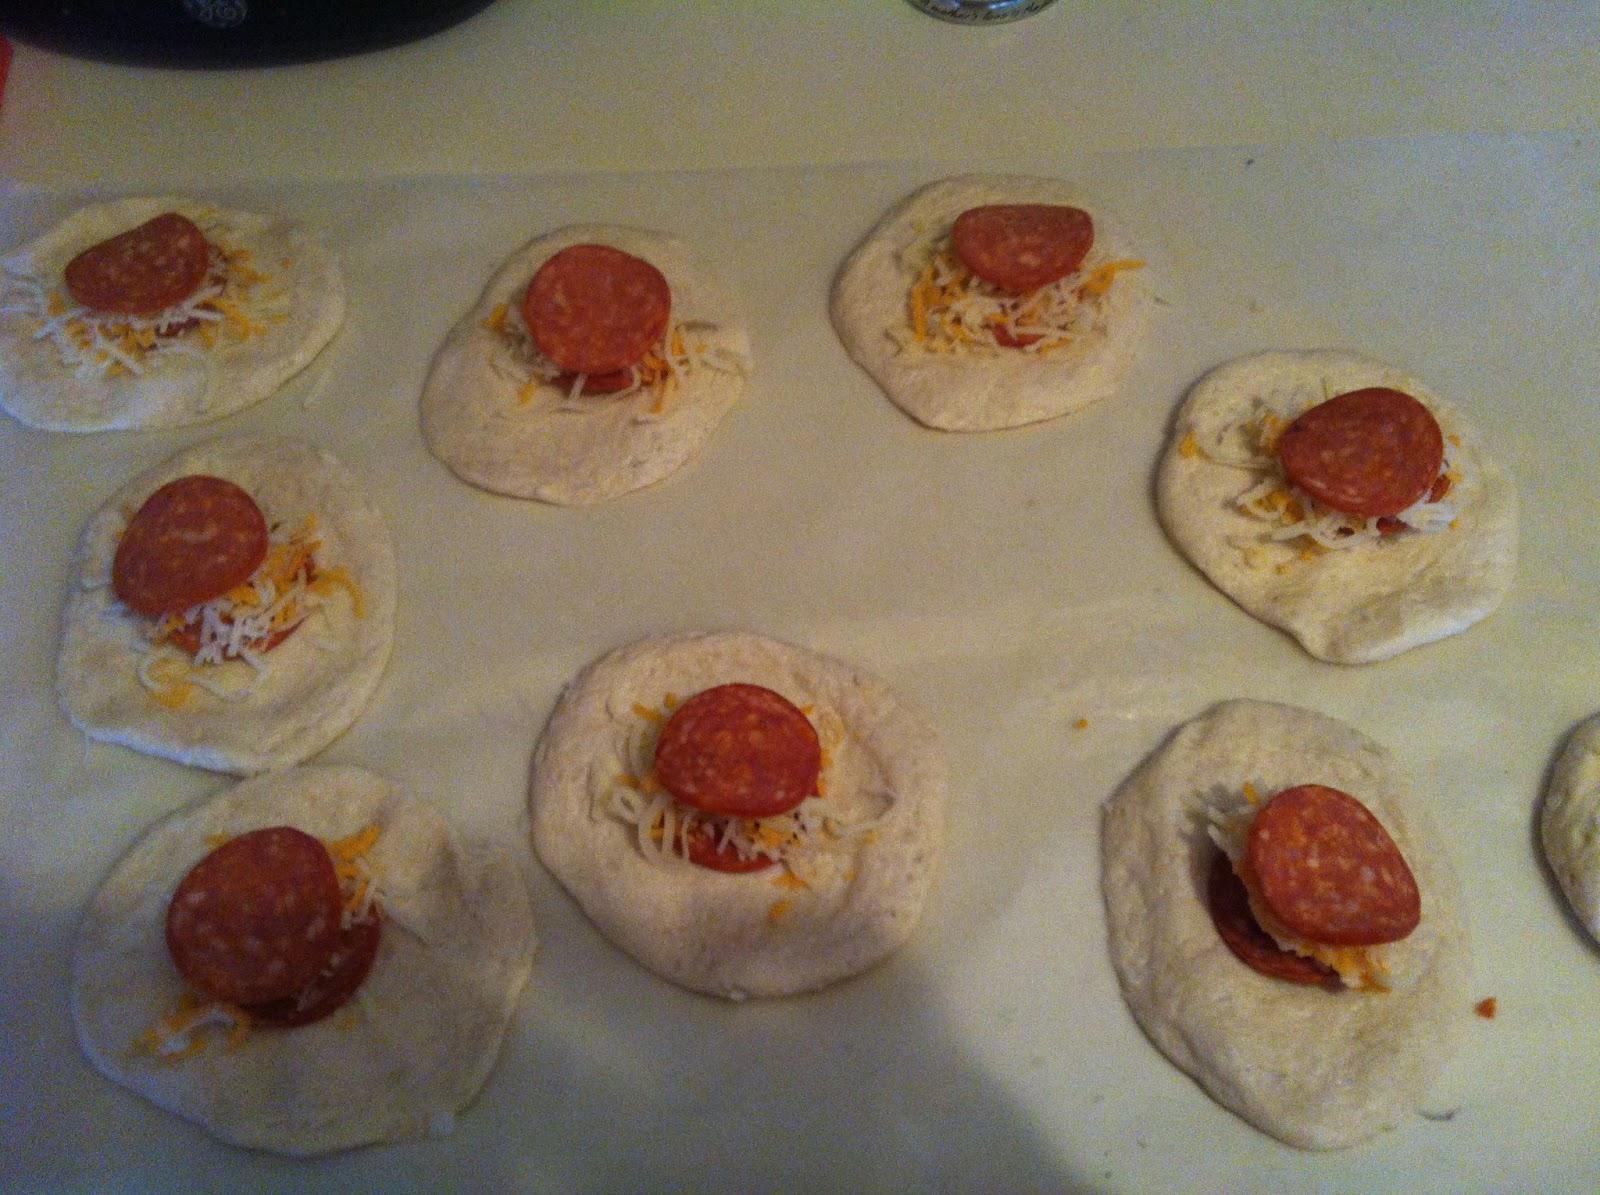 HALF BAKED: Pizza Balls